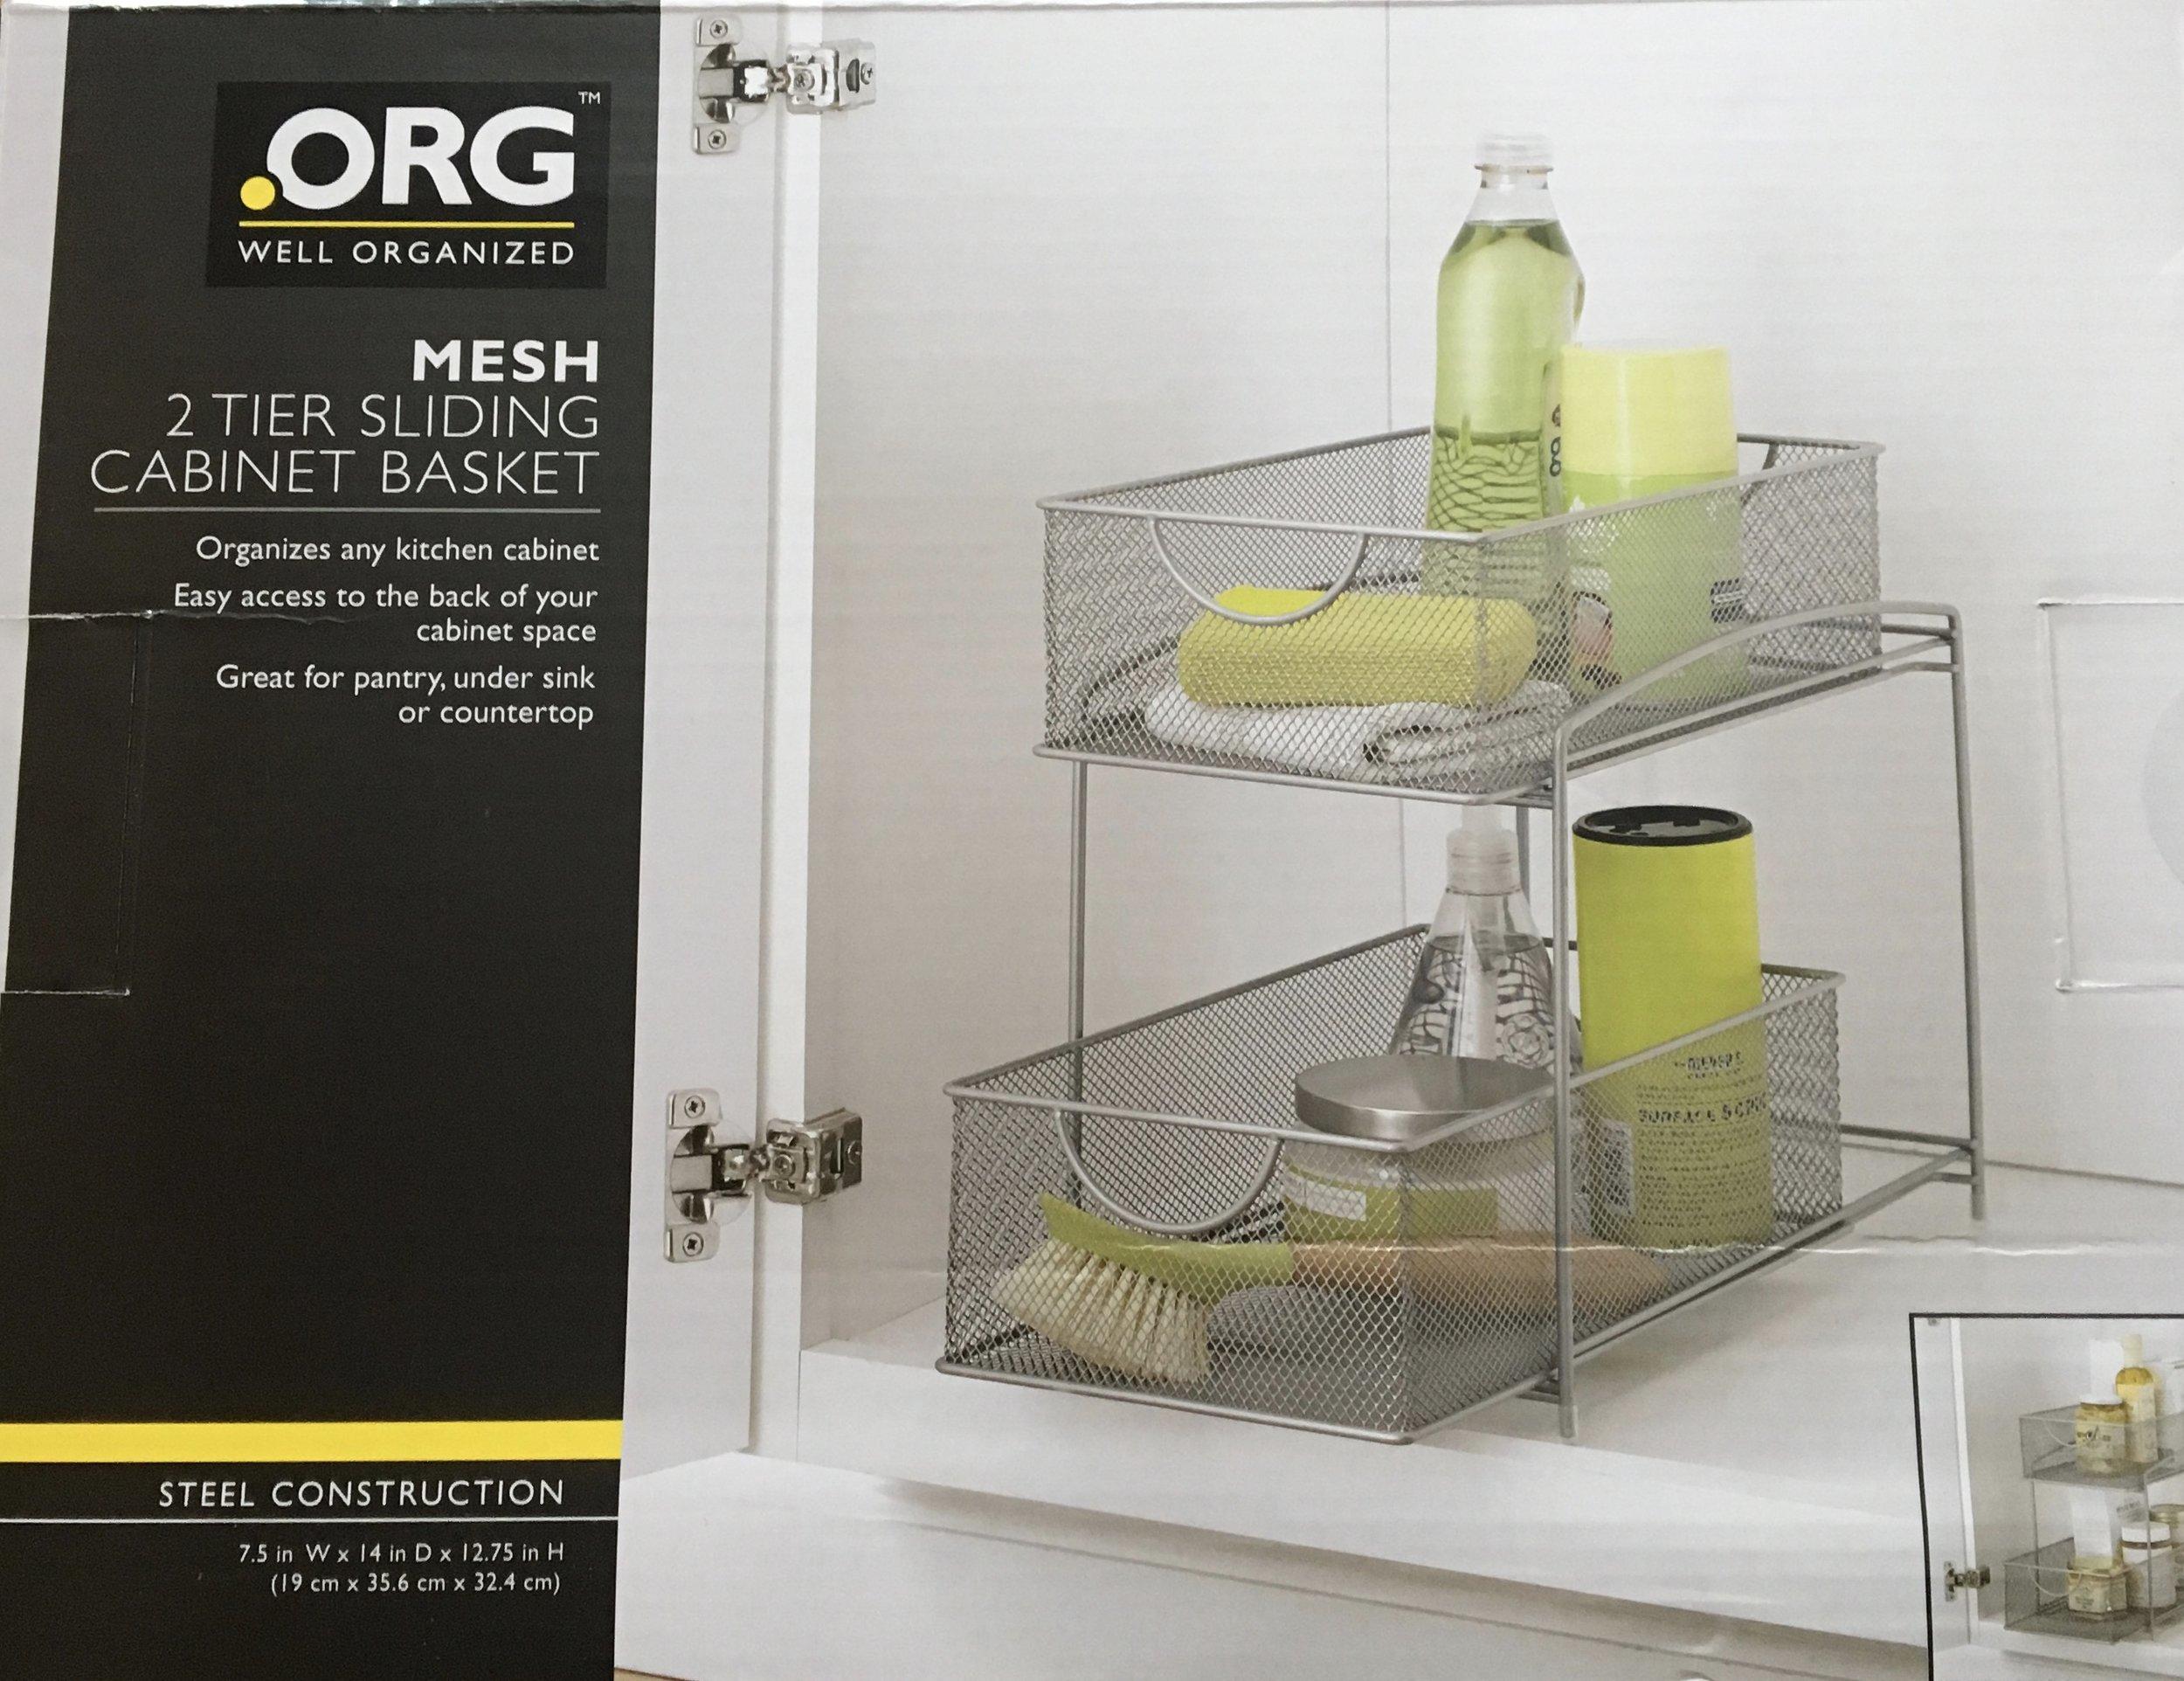 Under Sink Cabinet Basket